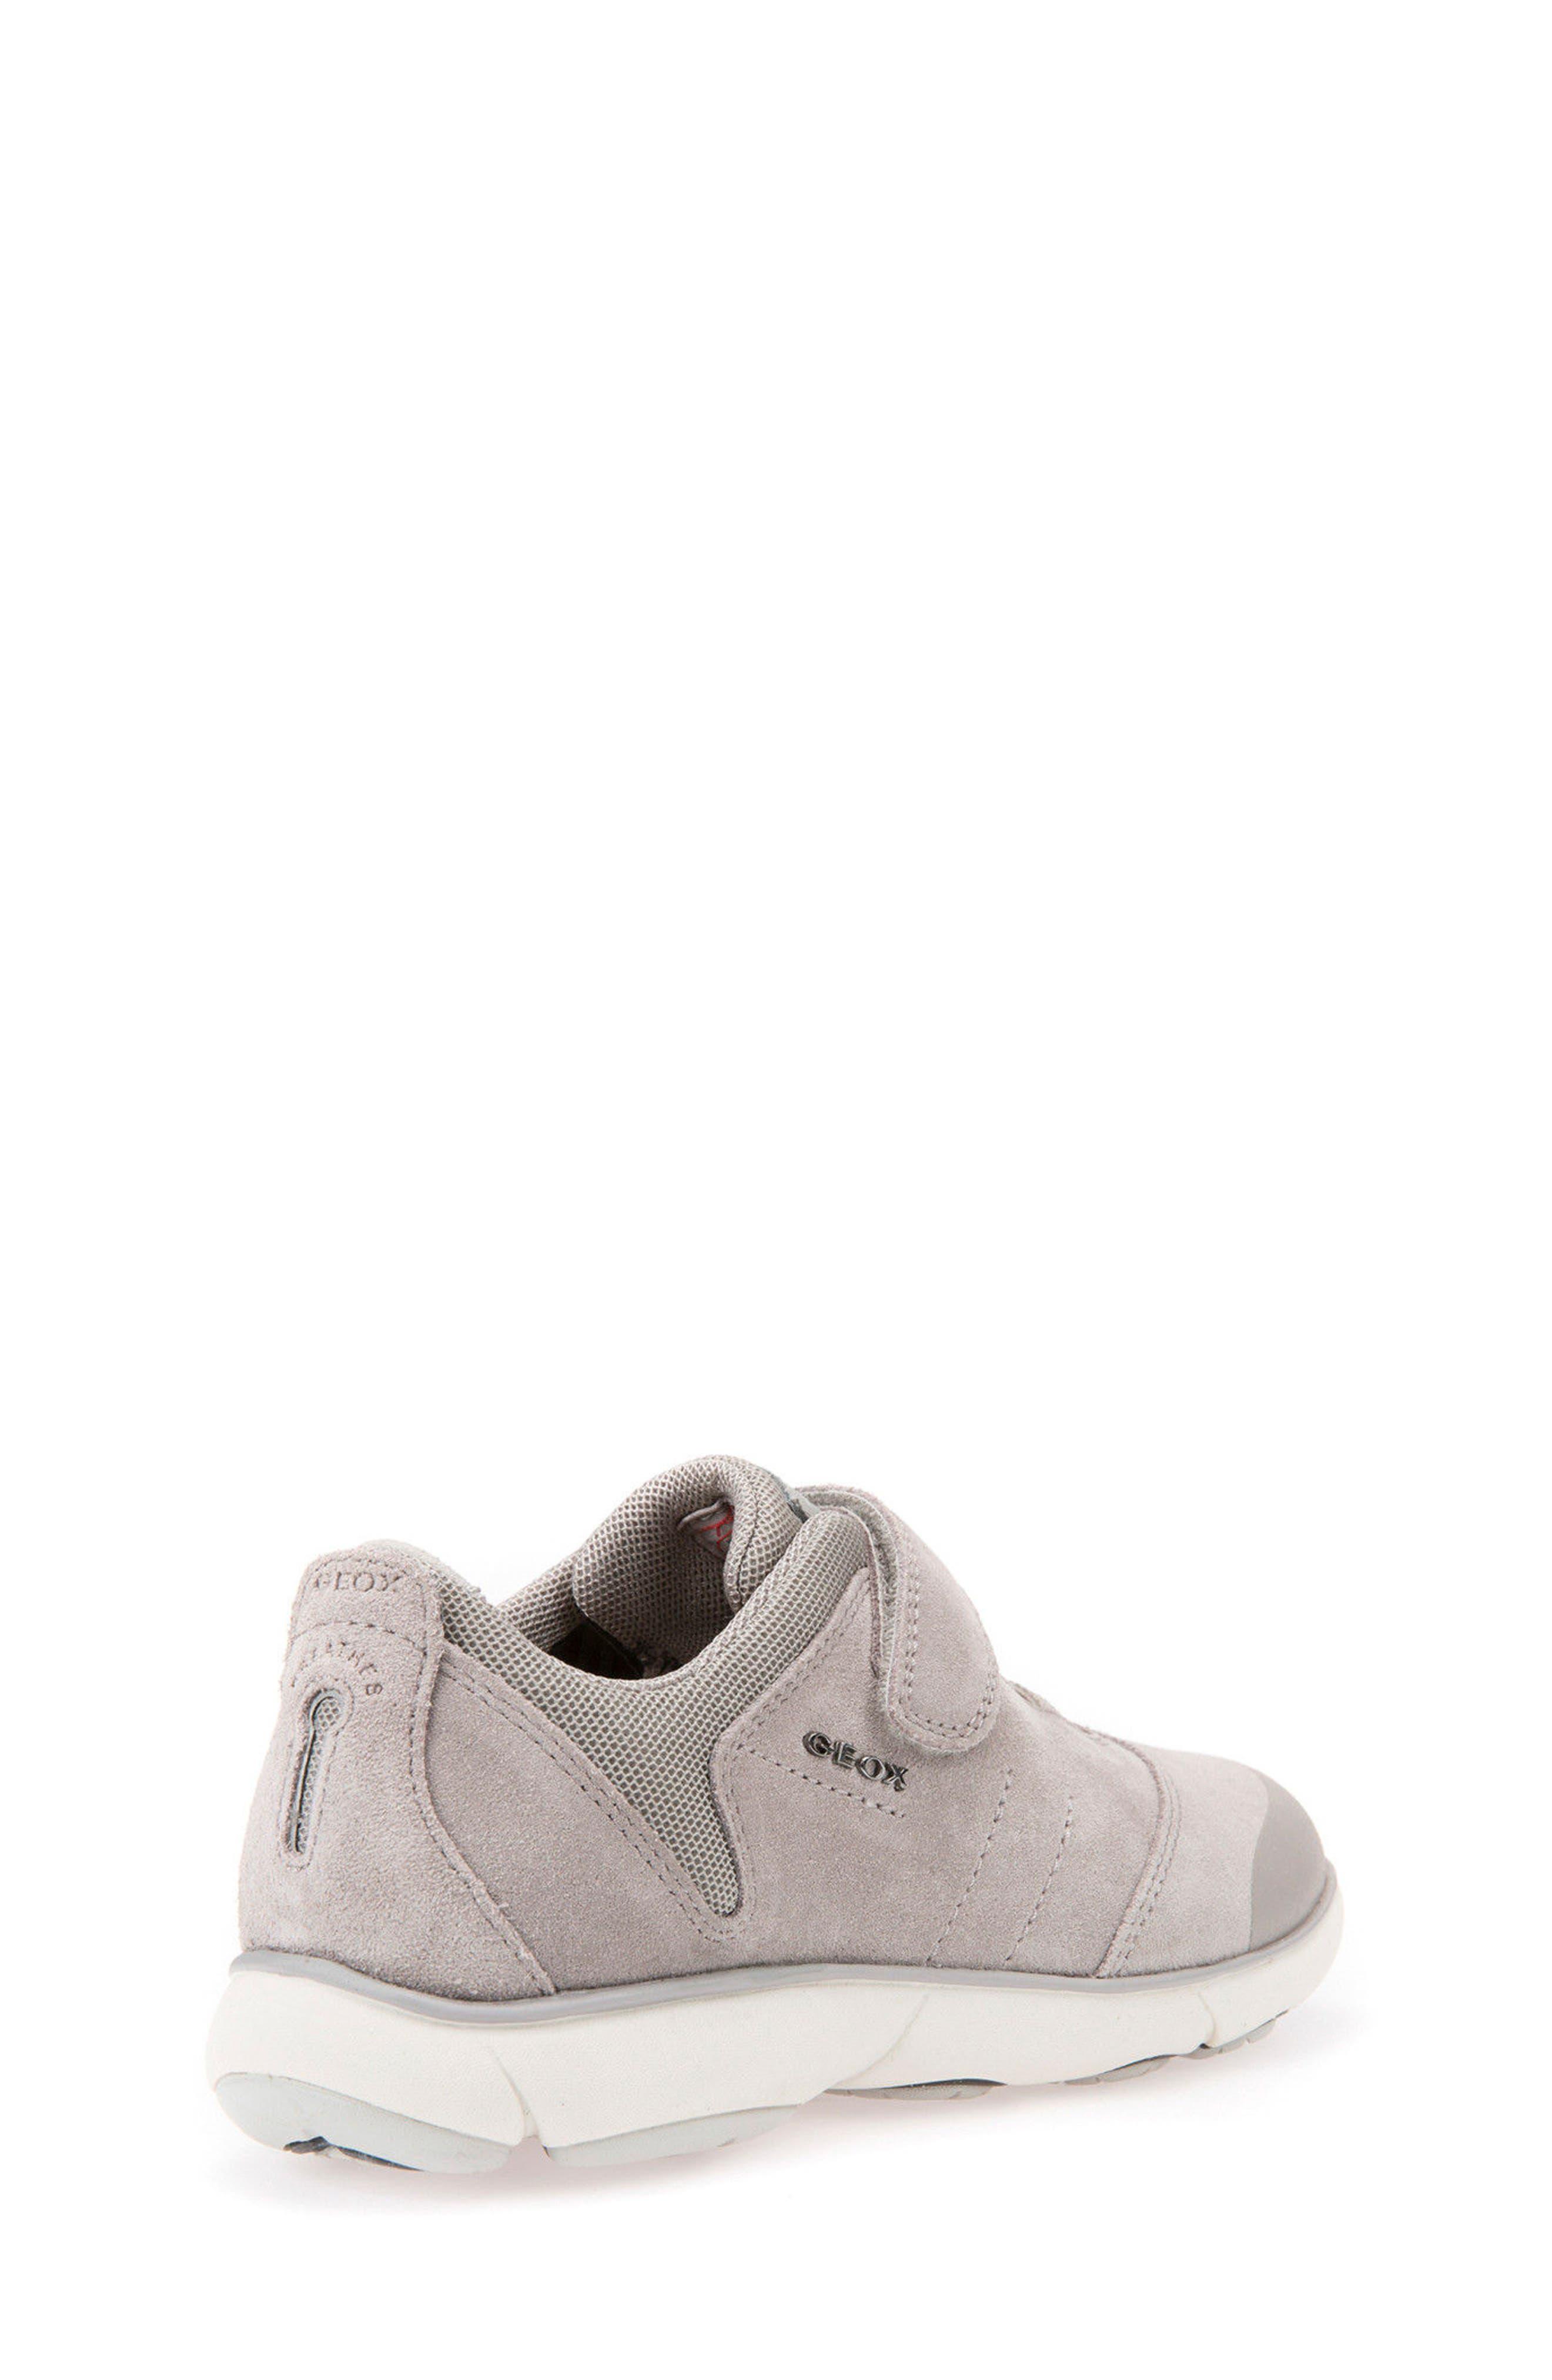 Nebula Low Top Sneaker,                             Alternate thumbnail 7, color,                             Grey